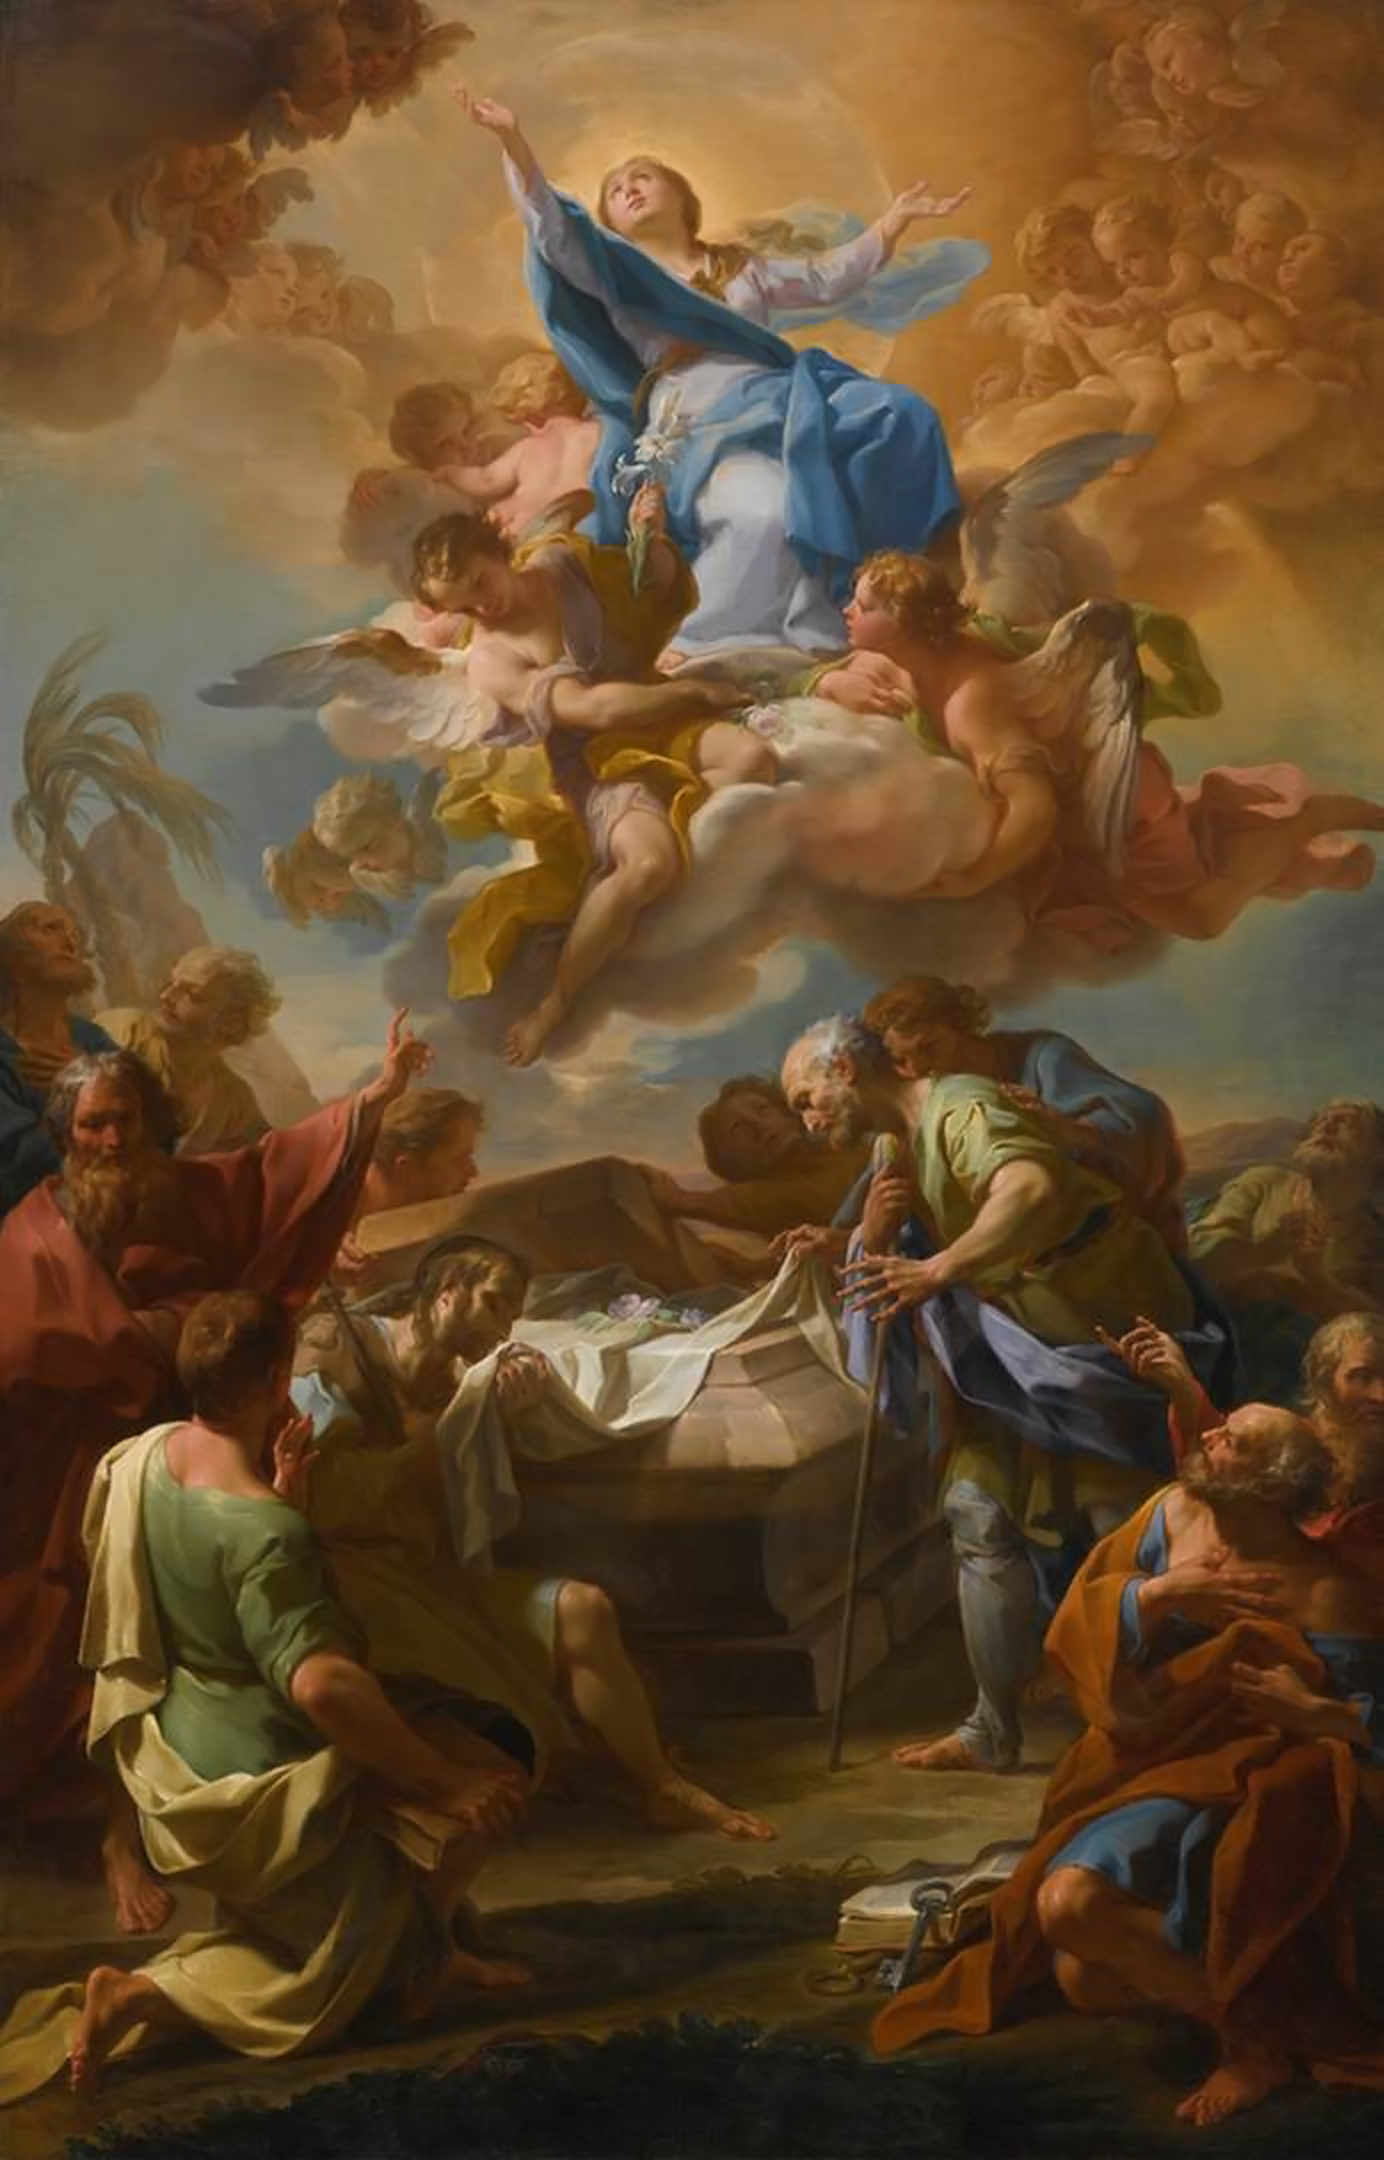 Assumption of the Virgin, by Corrado Giaquinto, c. 1740s. Private collection. Via IllustratedPrayer.com